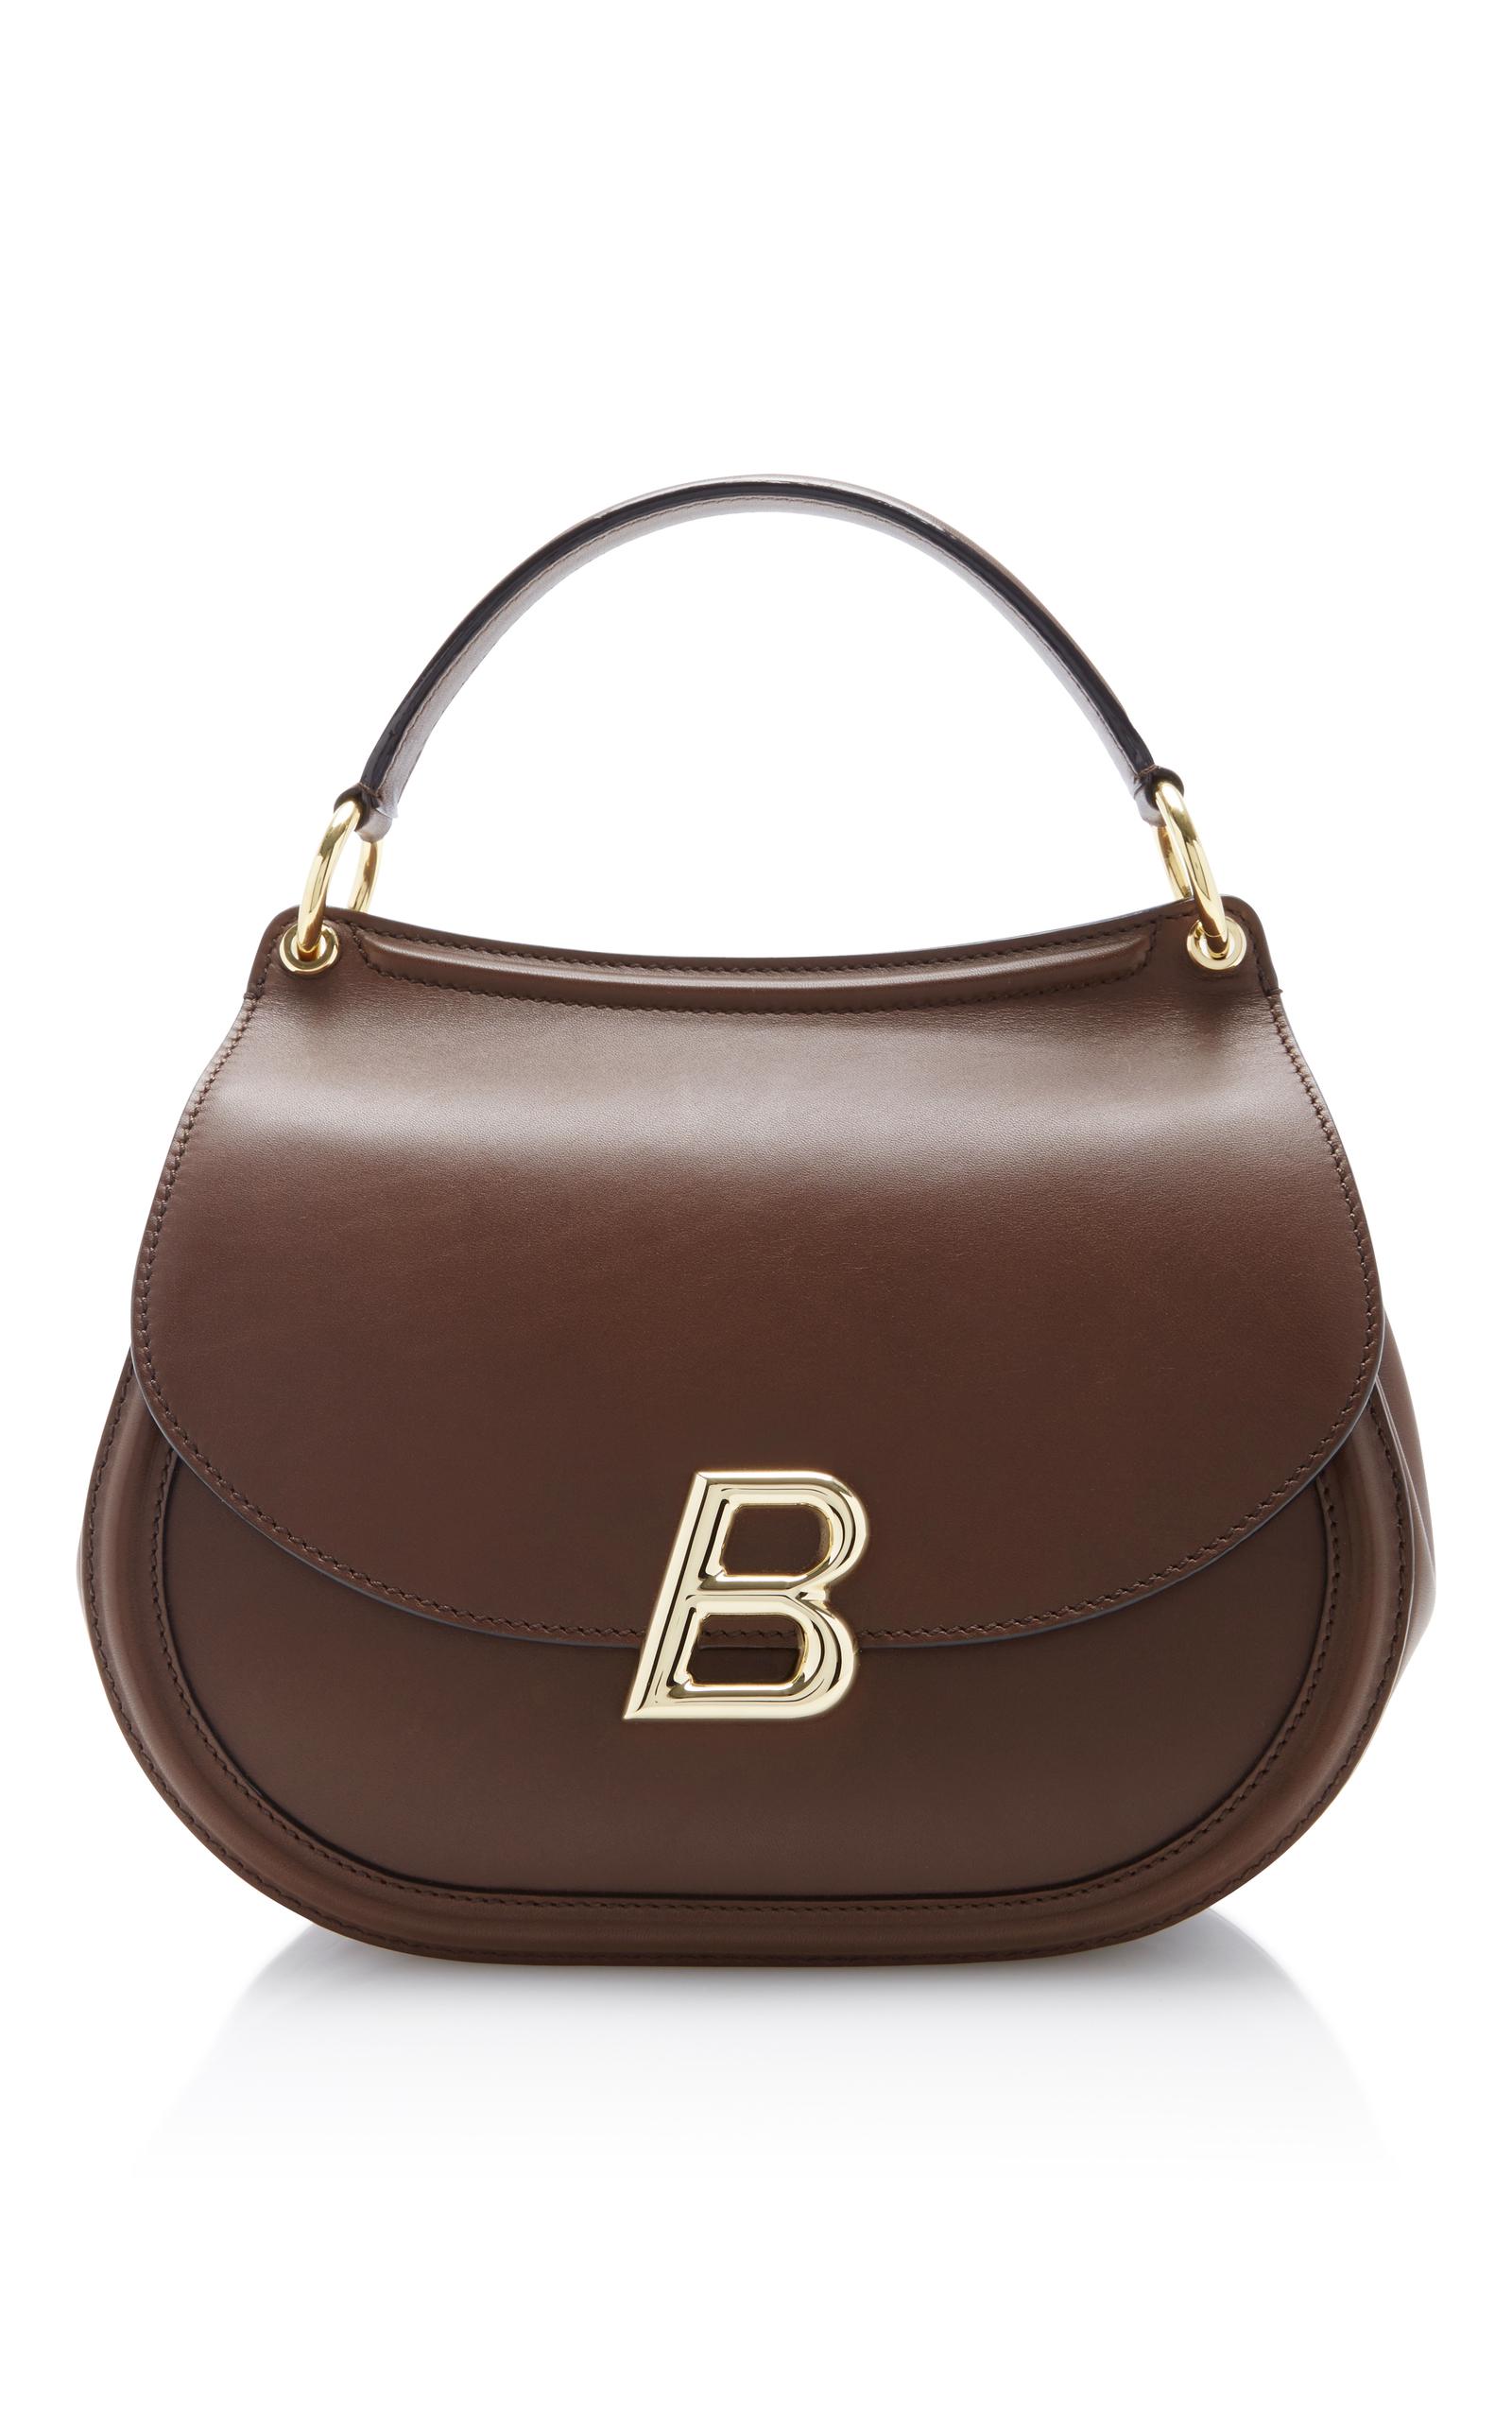 Ballyum handbag - Black Bally Very Cheap Cheap Online Sale Online Store Outlet Store Online Cheapest  Discount Release Dates JHhgB